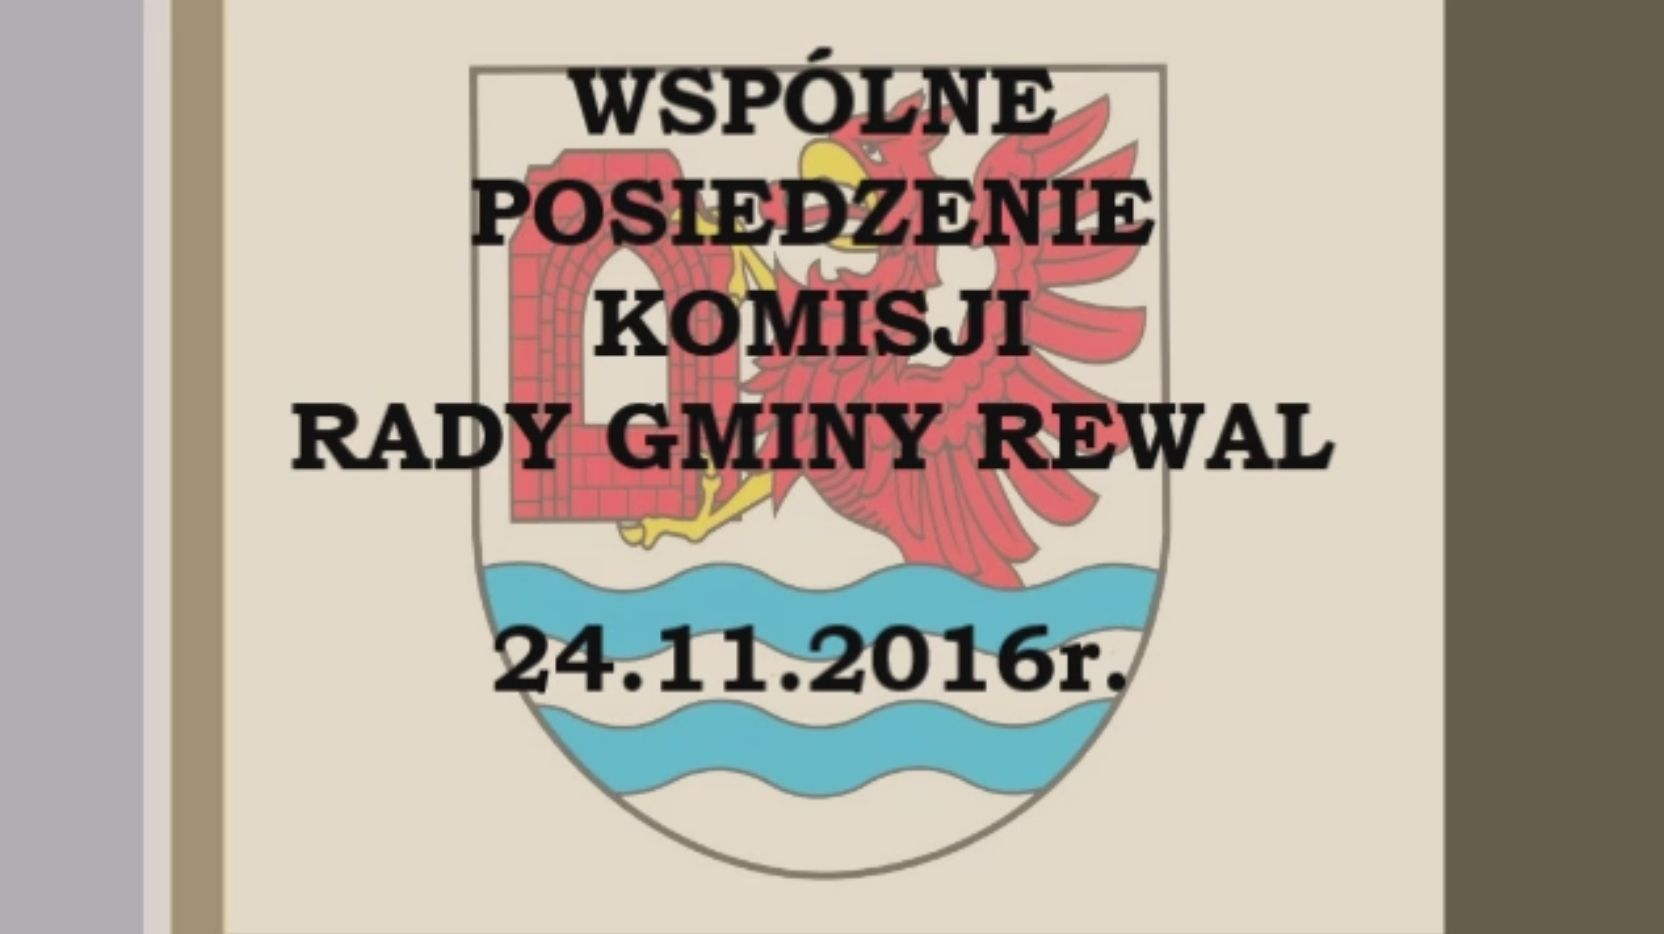 rewal/2016-039.Komisje_wspolne_24-11-2016.jpg